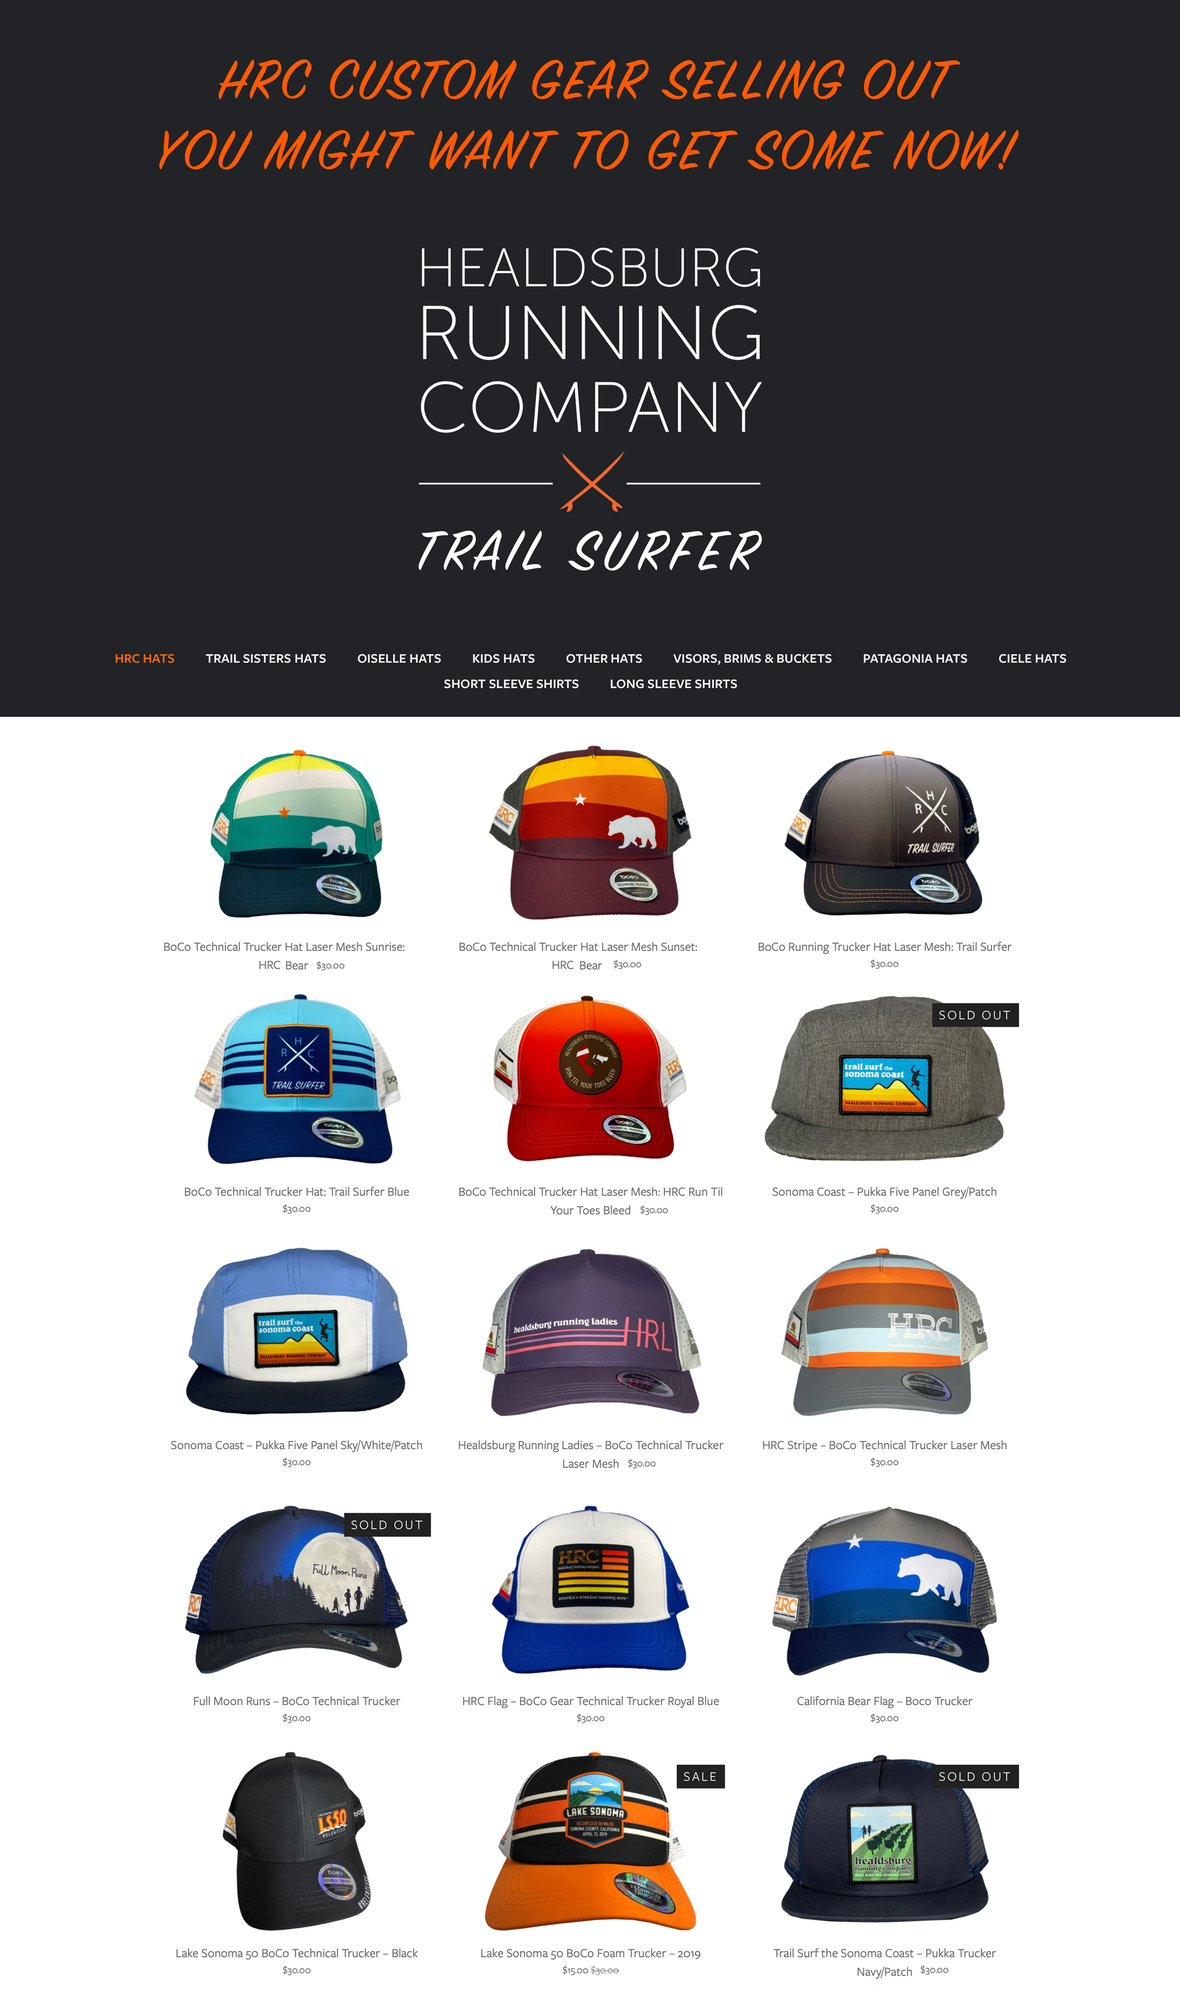 trail-surfer-ad